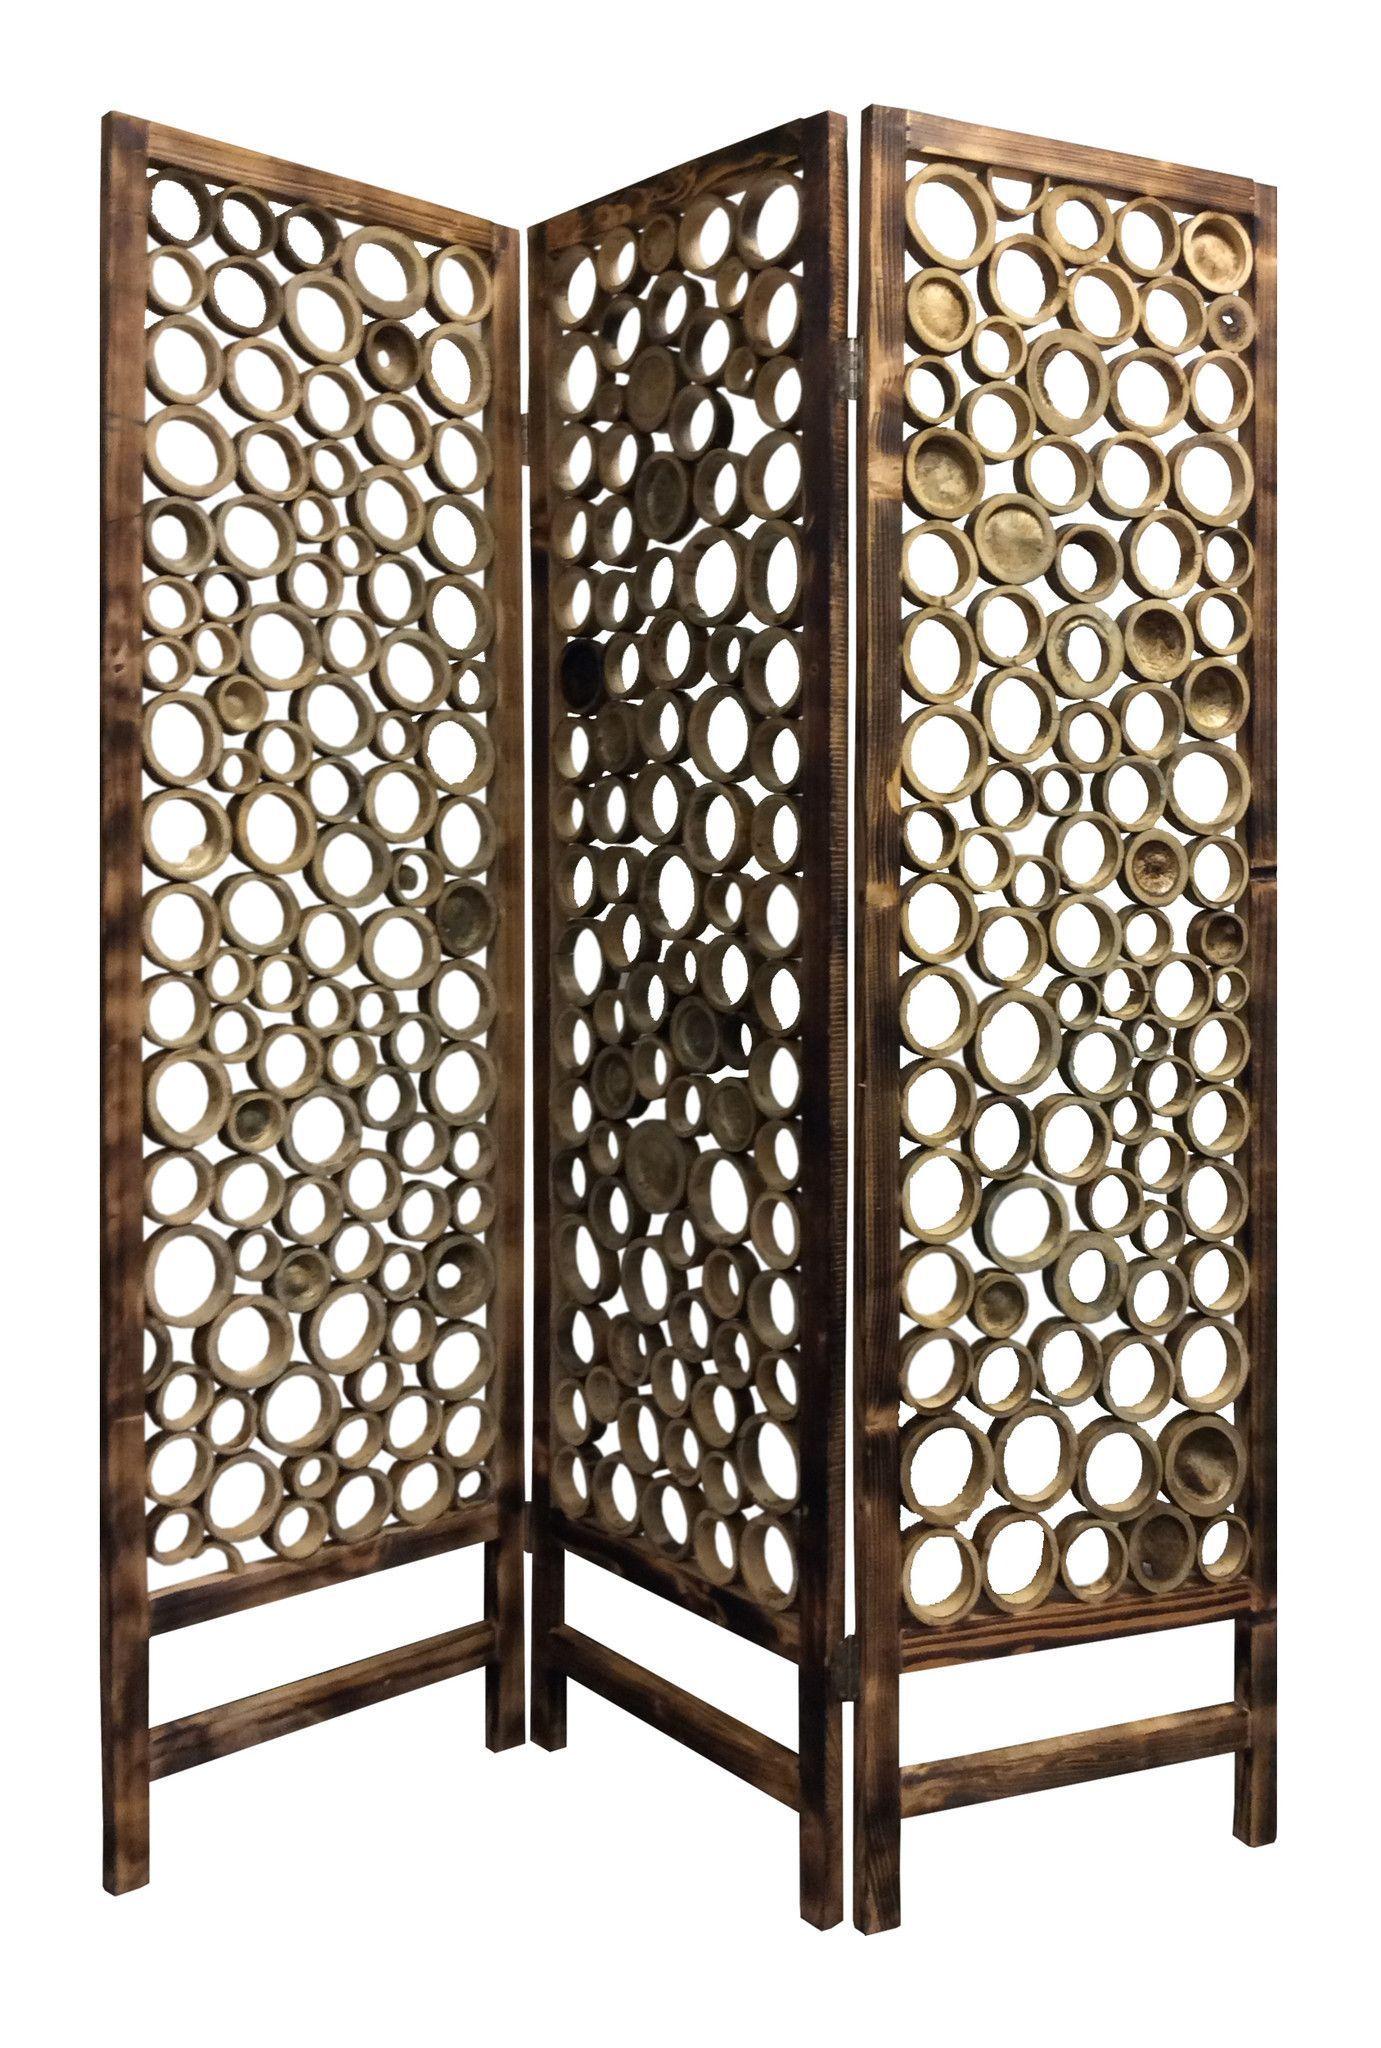 Screen gems bamboo slice screen sg gems screens and bamboo